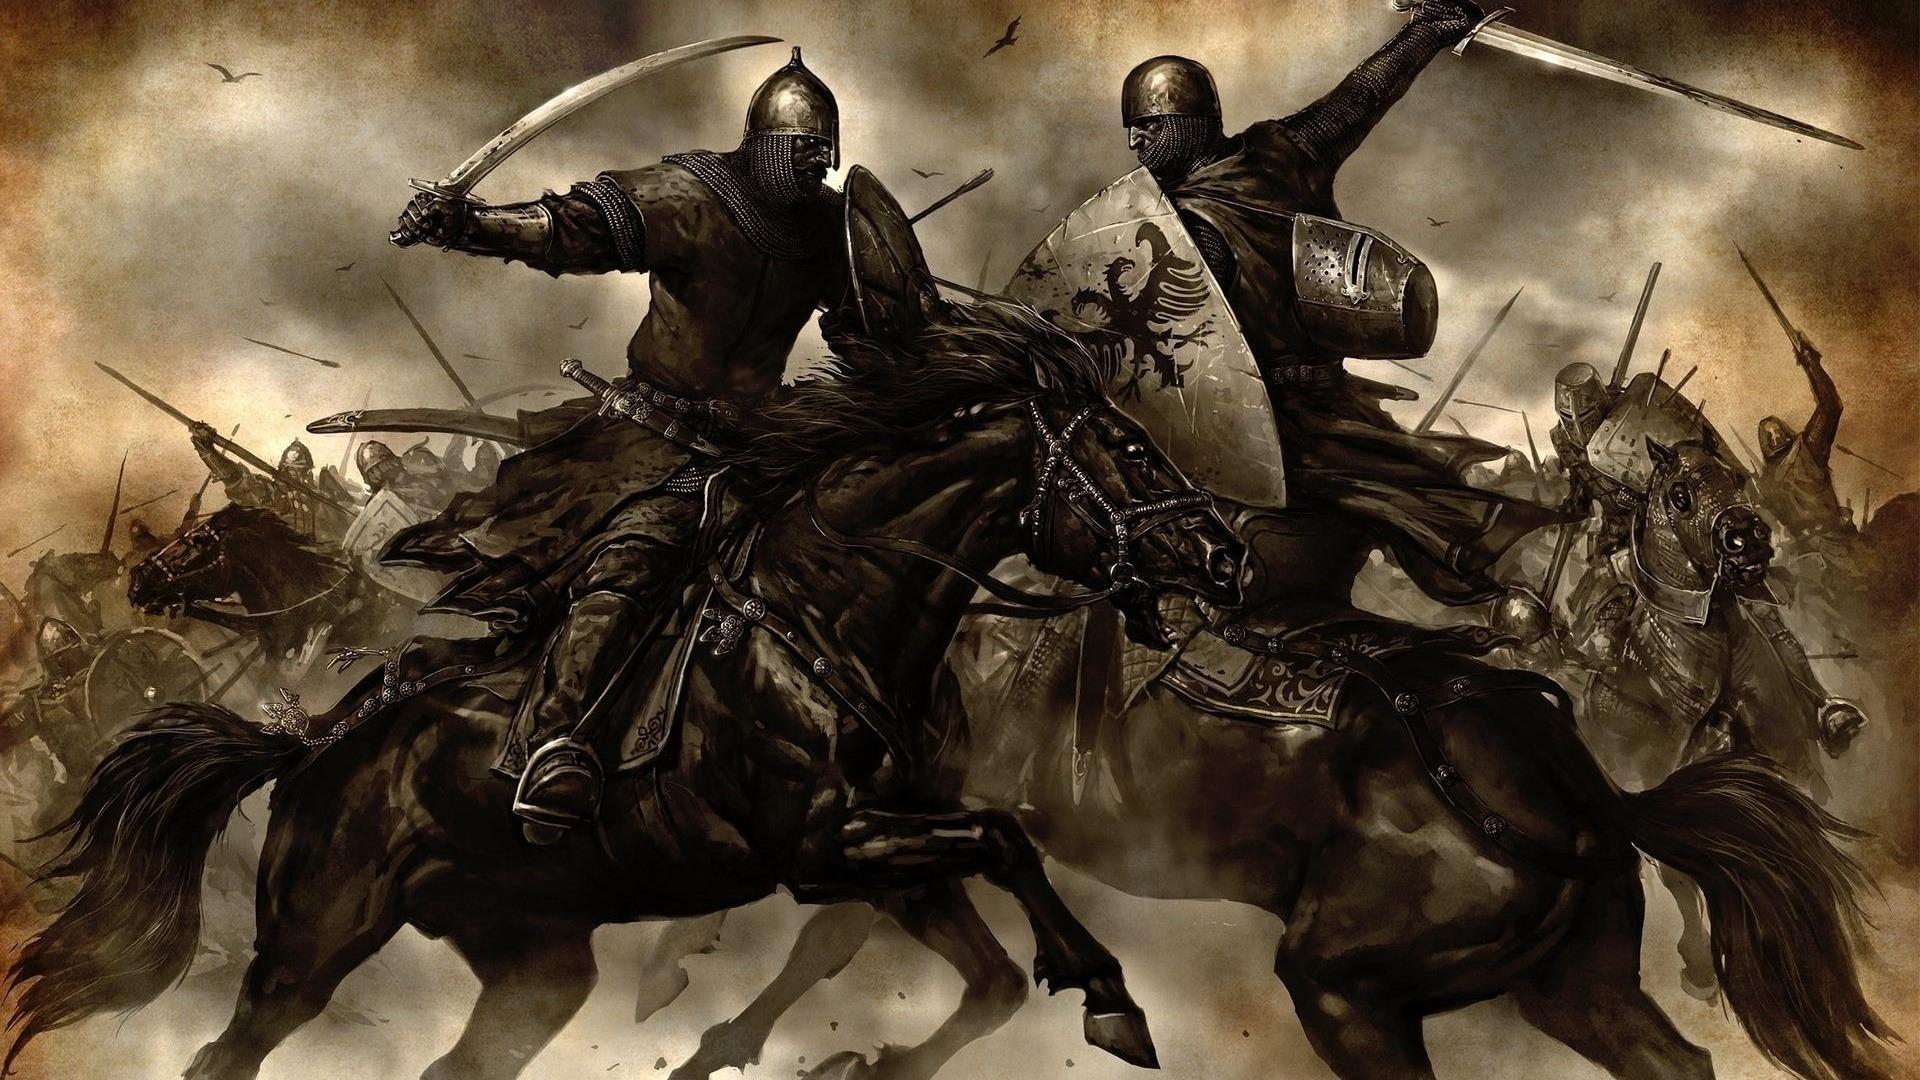 Knight Wallpapers - WallpaperSafari